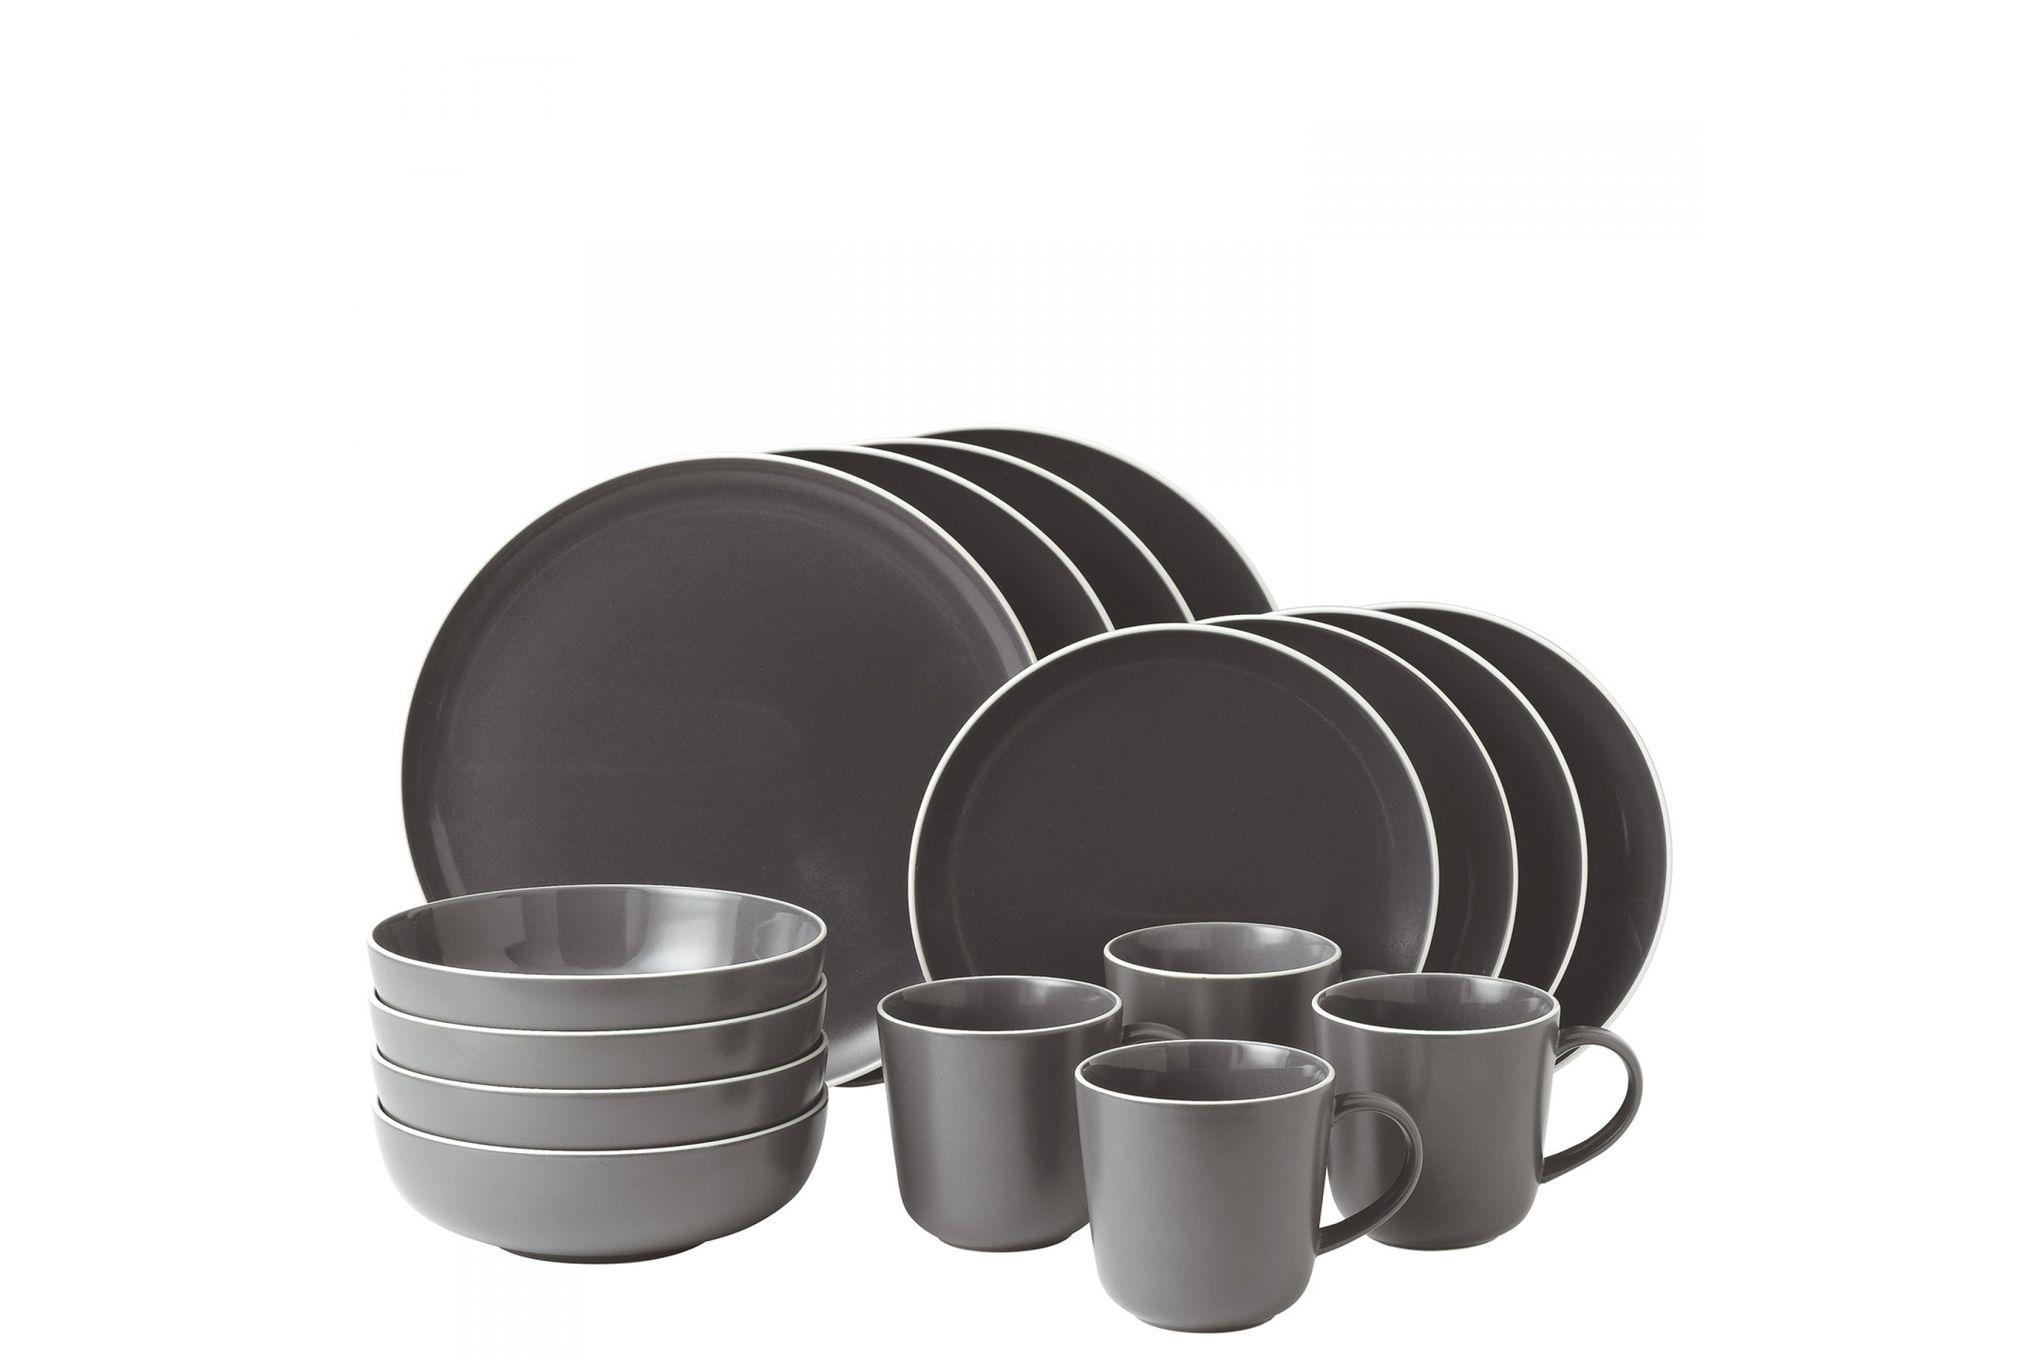 Gordon Ramsay for Royal Doulton Bread Street Slate 16 Piece Set 4 x Plate 28cm, Plate 22cm, Bowl 18cm, Mug thumb 1